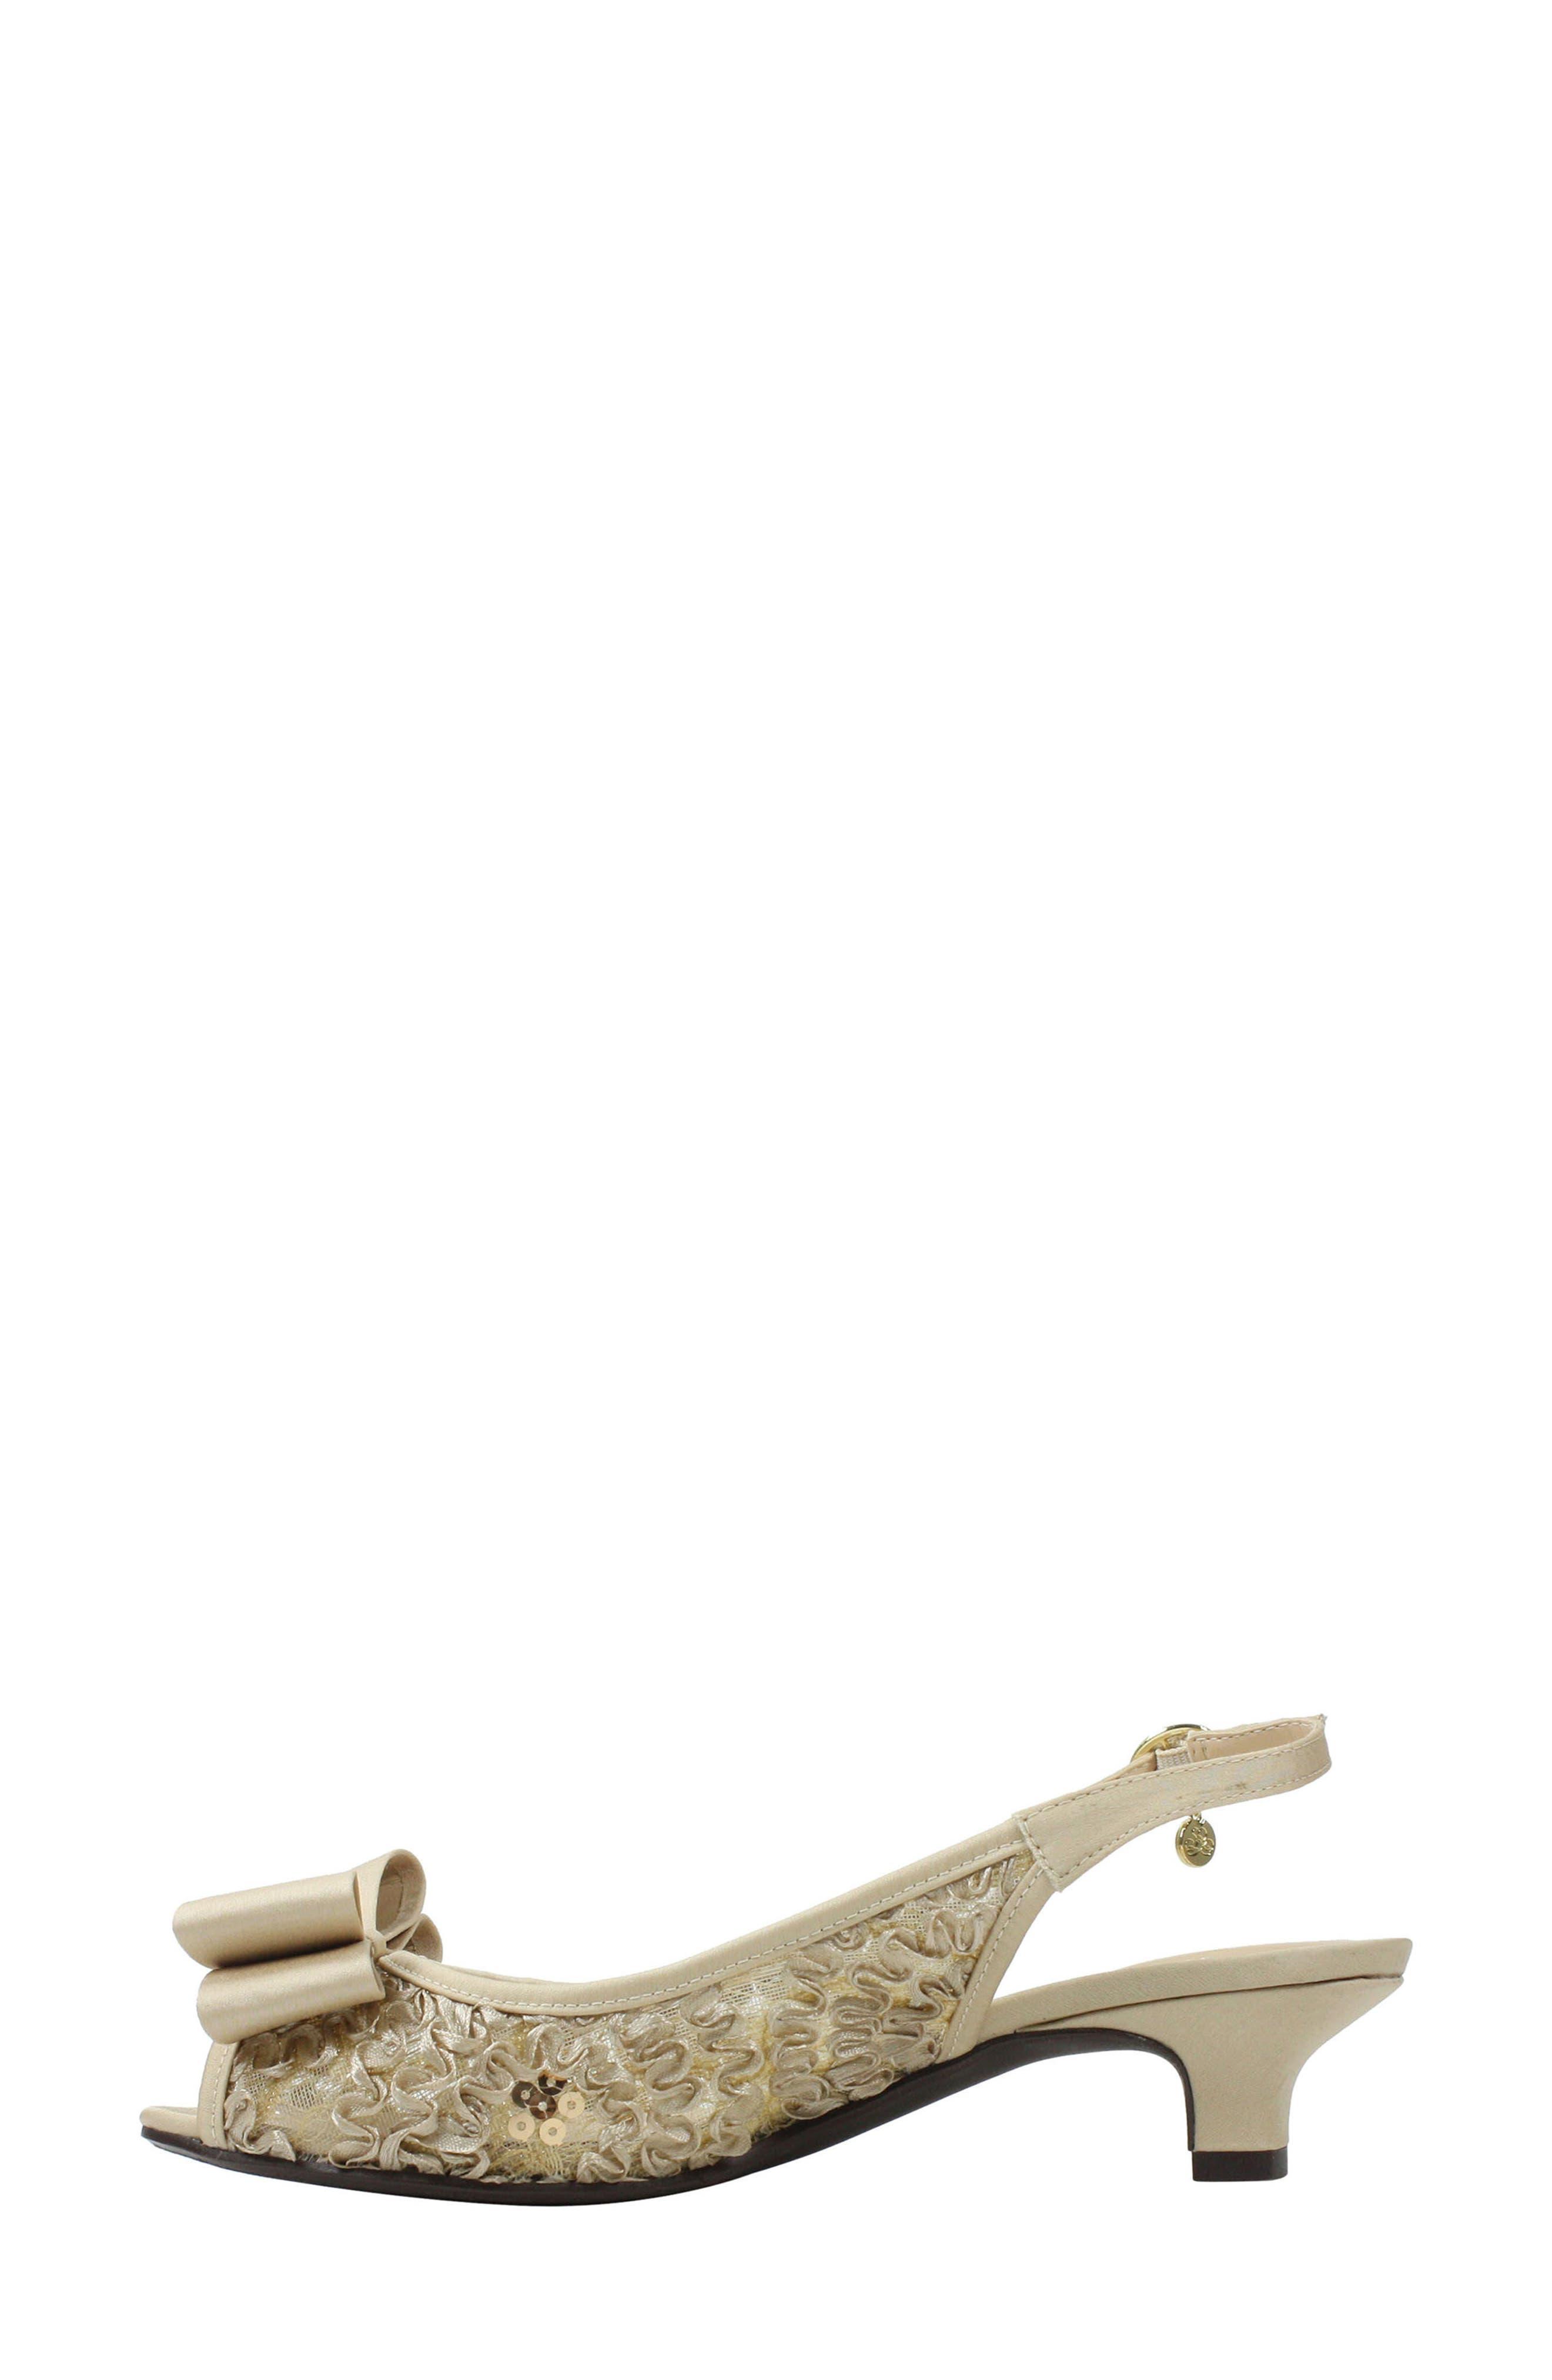 Landan Bow Slingback Sandal,                             Alternate thumbnail 2, color,                             Champagne